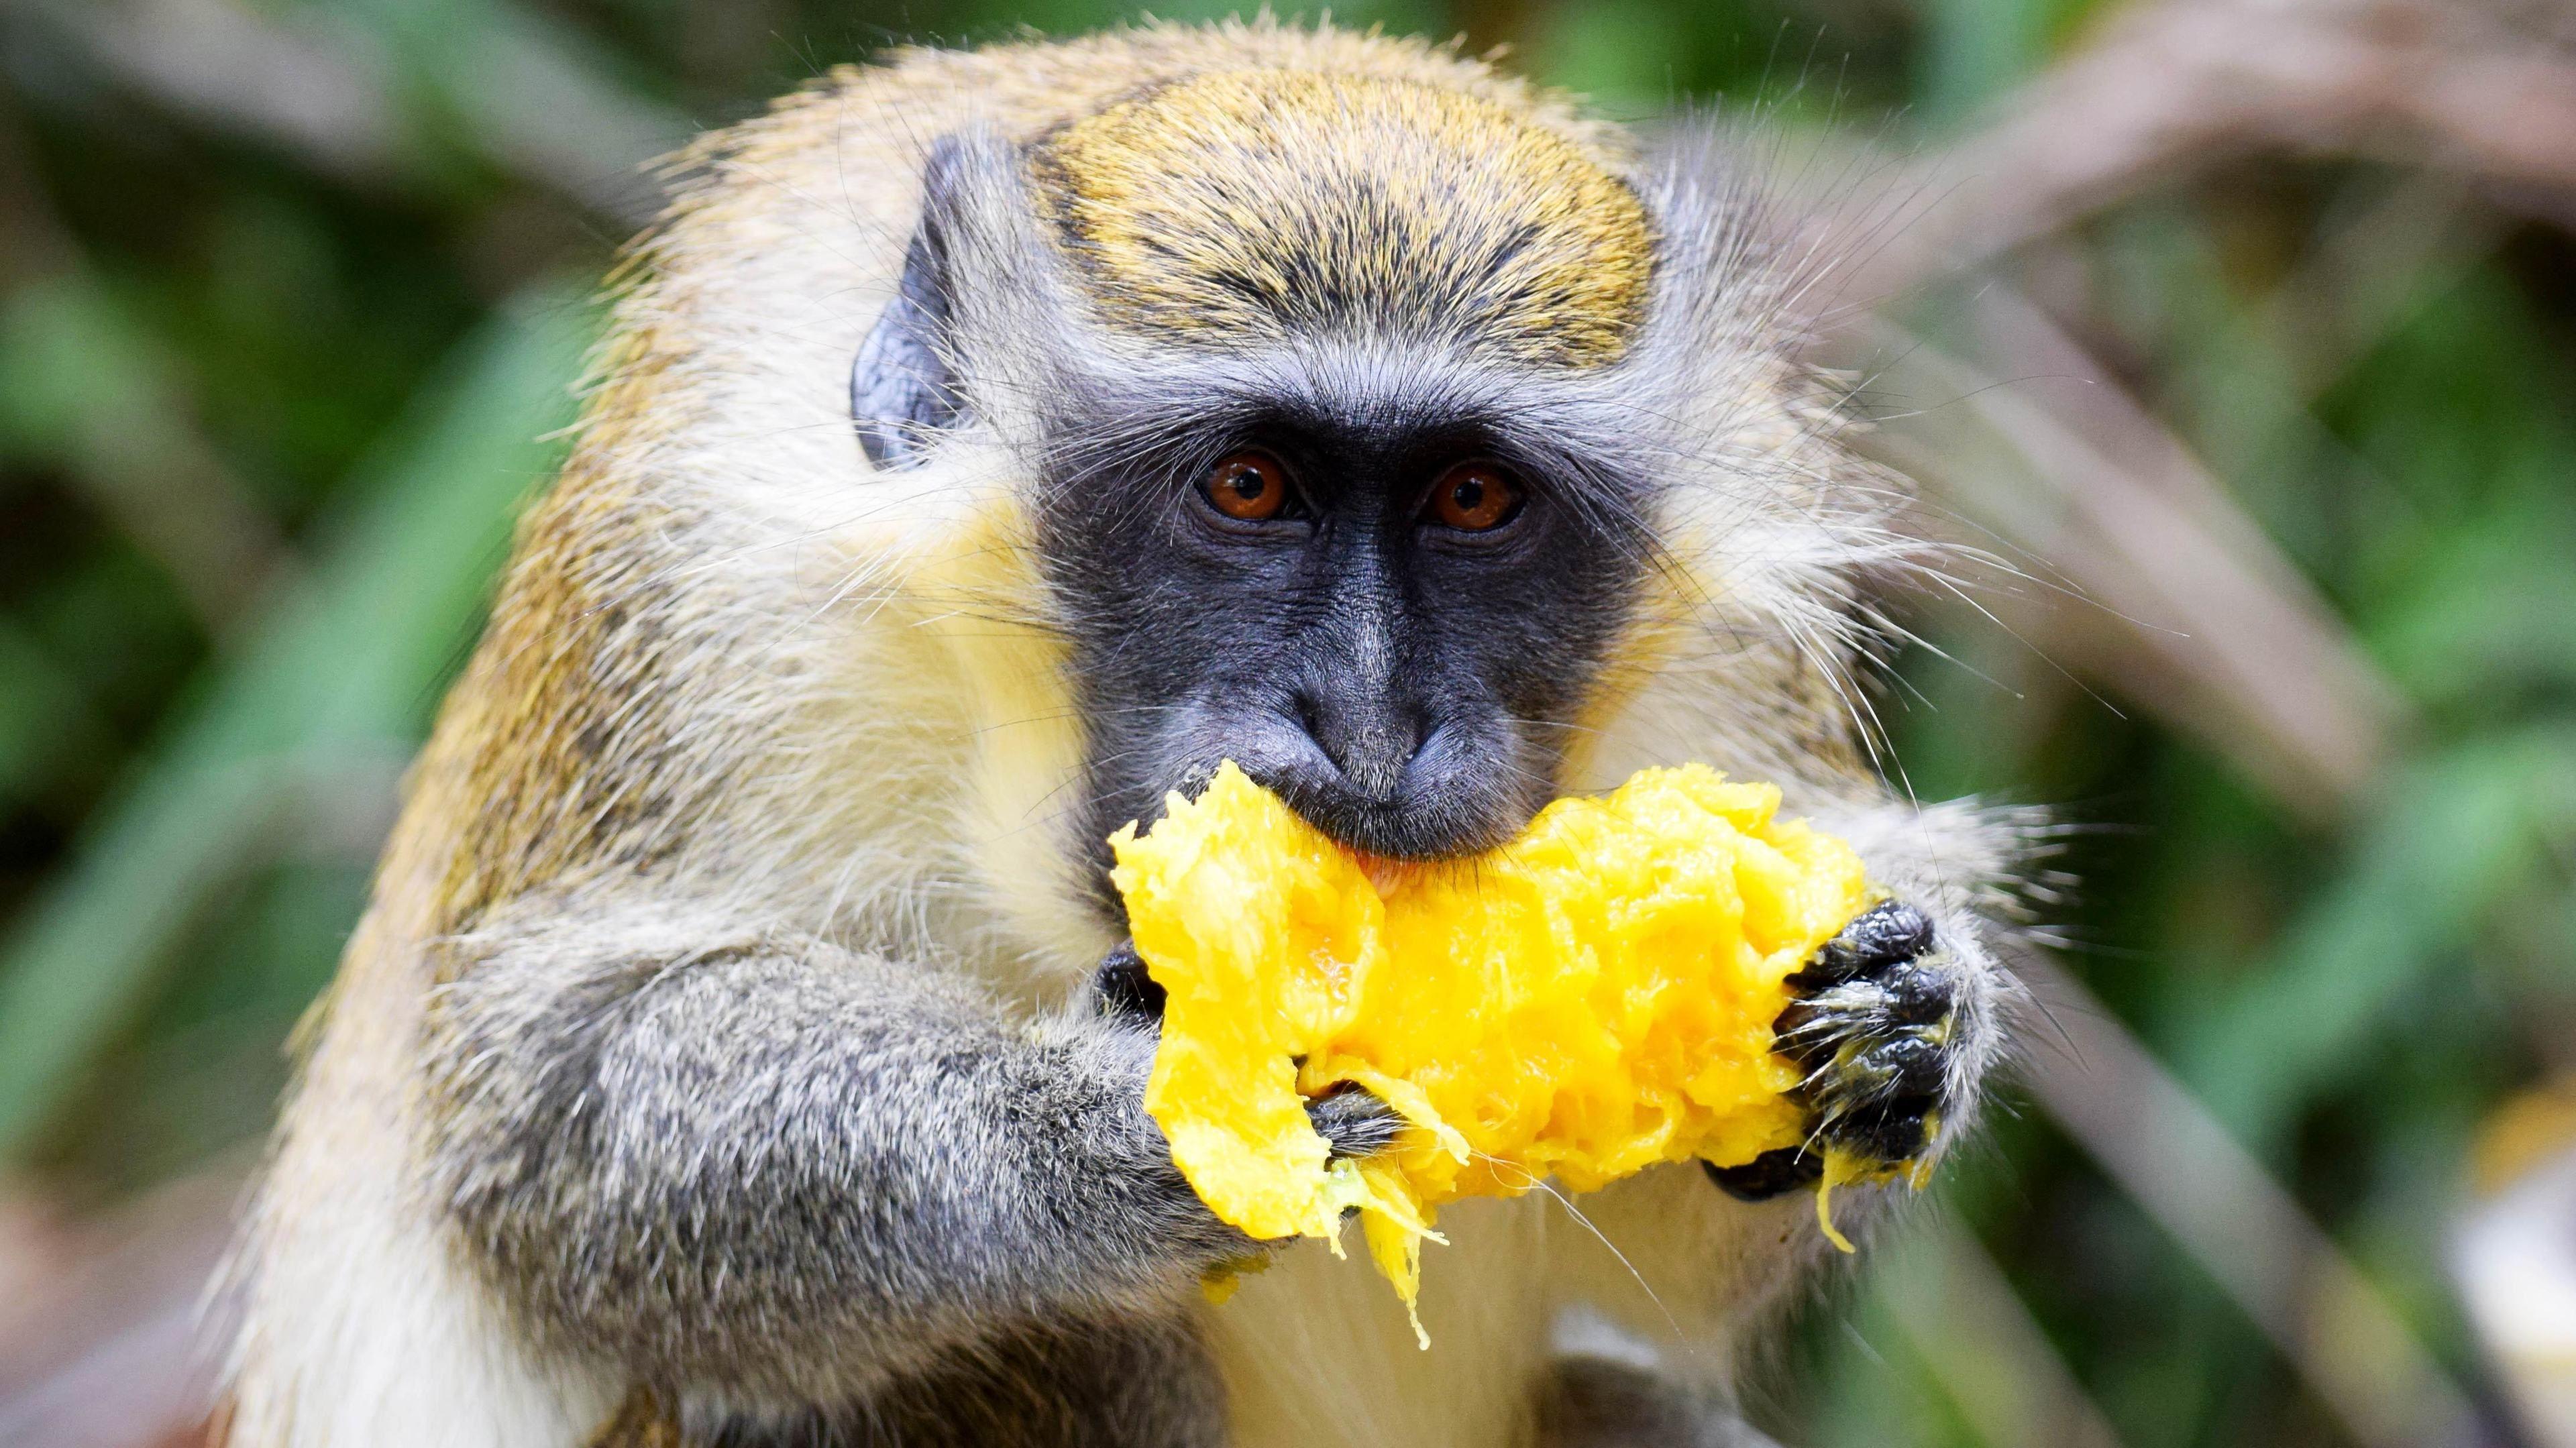 Black faced monkey eating a mango